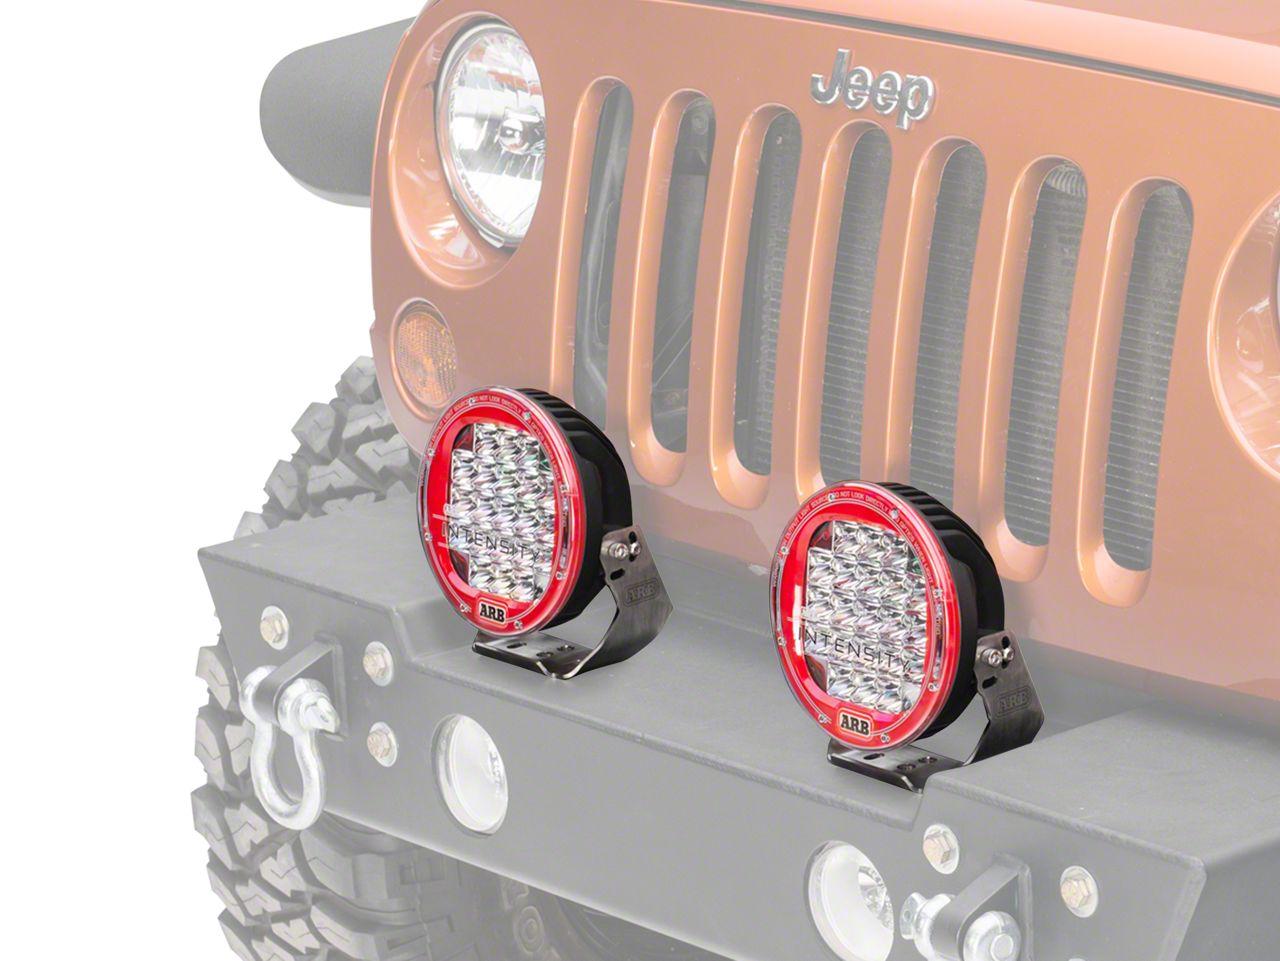 [SCHEMATICS_48ZD]  ARB Jeep Wrangler Intensity 7 in. Round 21 LED Light - Flood Beam AR21F   Arb Wiring Harness Lighting      ExtremeTerrain